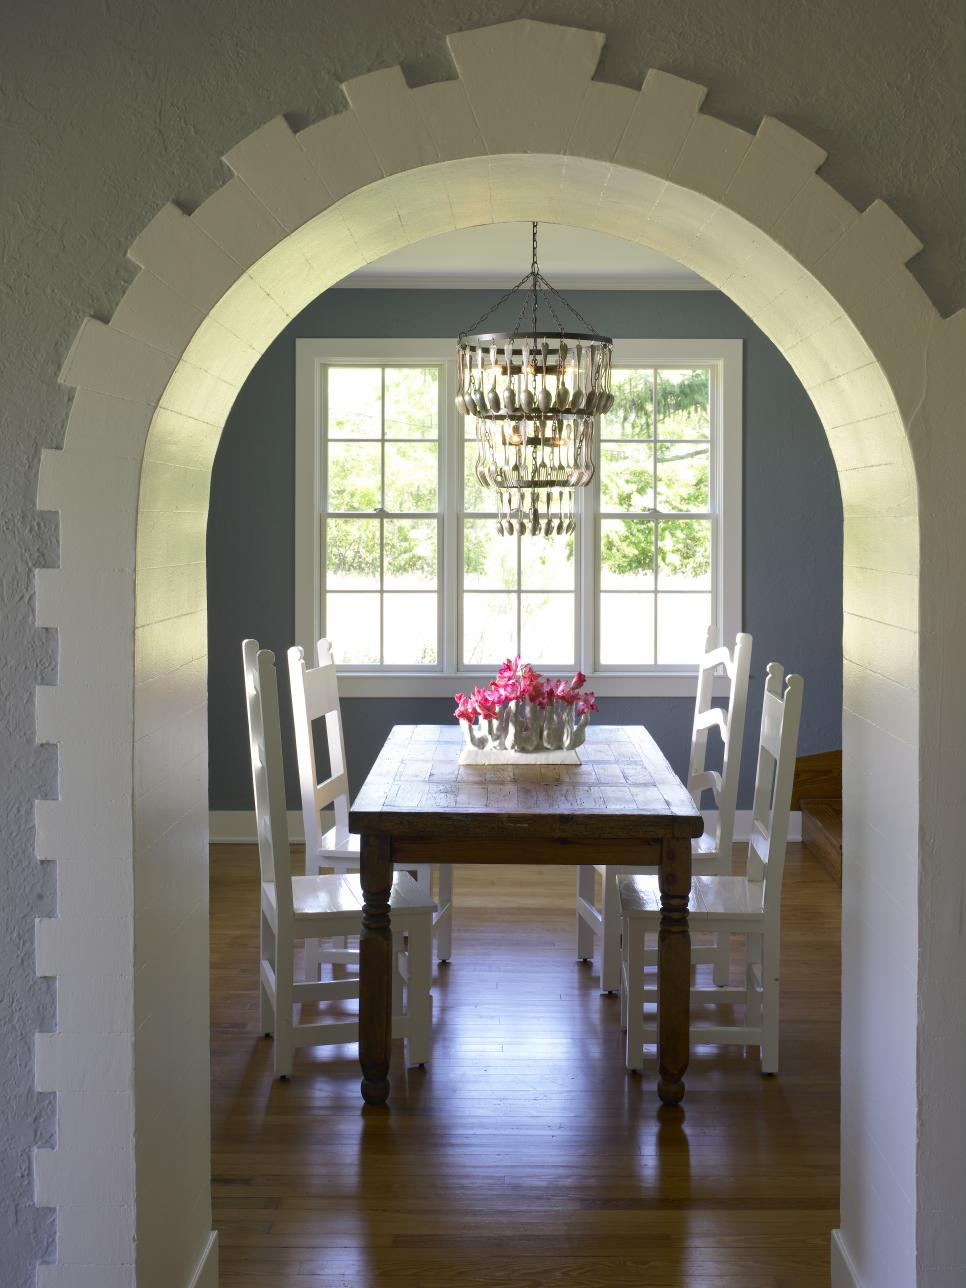 6 dining room trends to try hgtv - Dining Room Lighting Trends